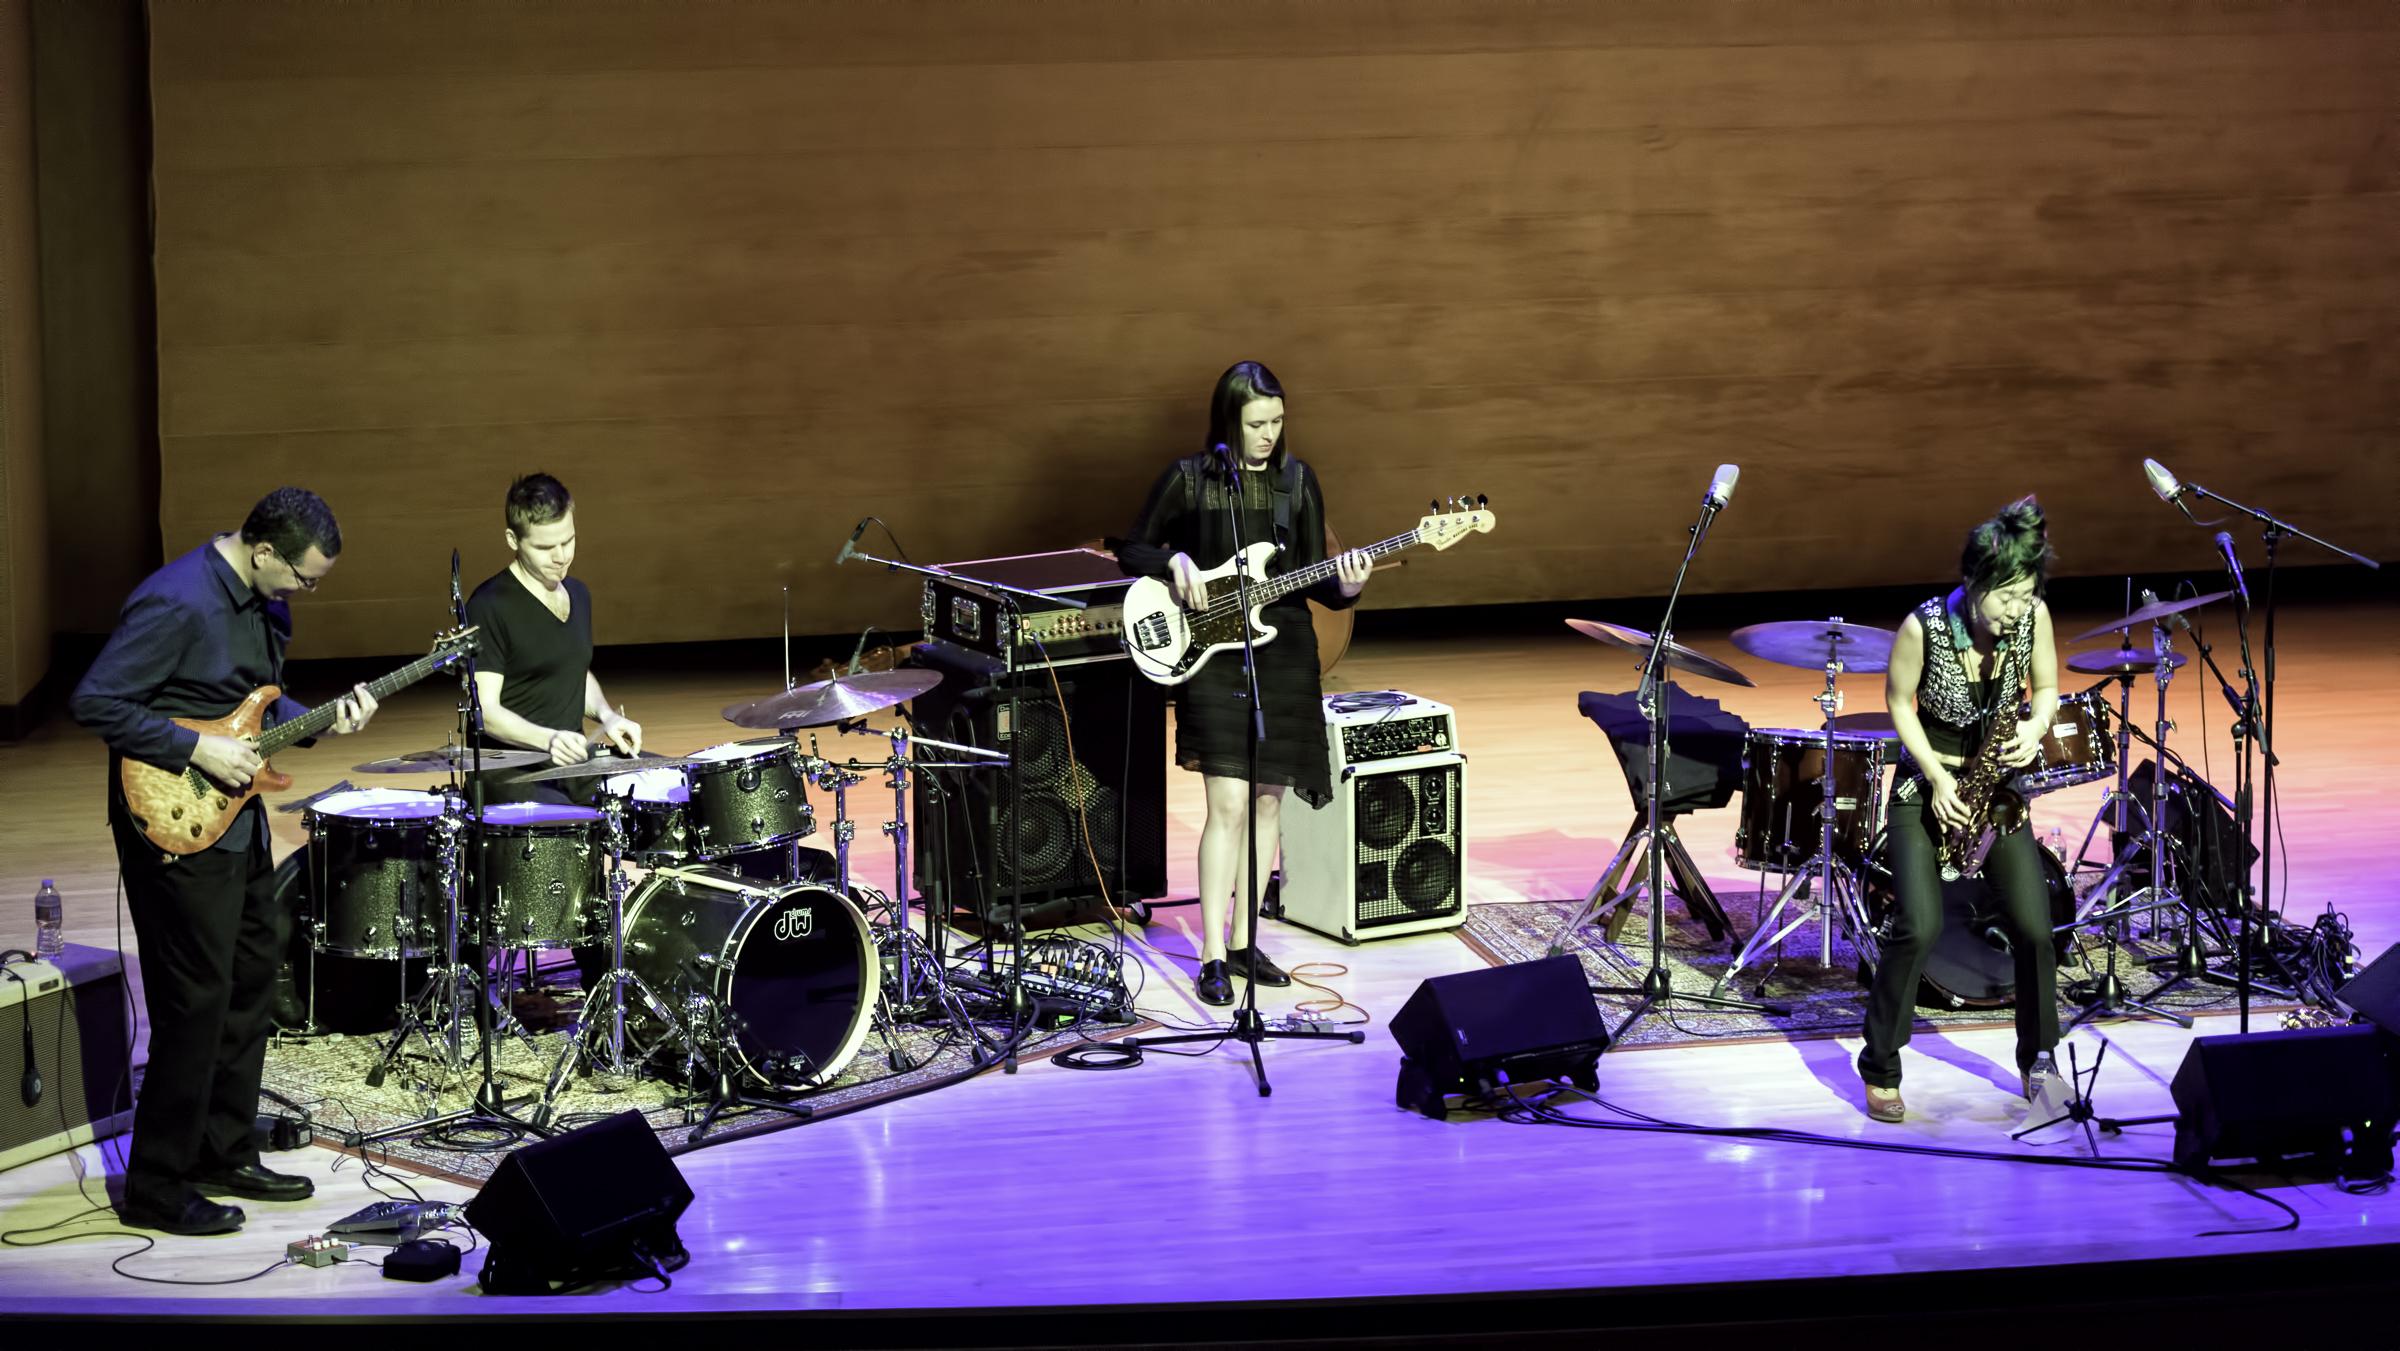 Grace Kelly Quartet at the Musical Instrument Museum (MIM)